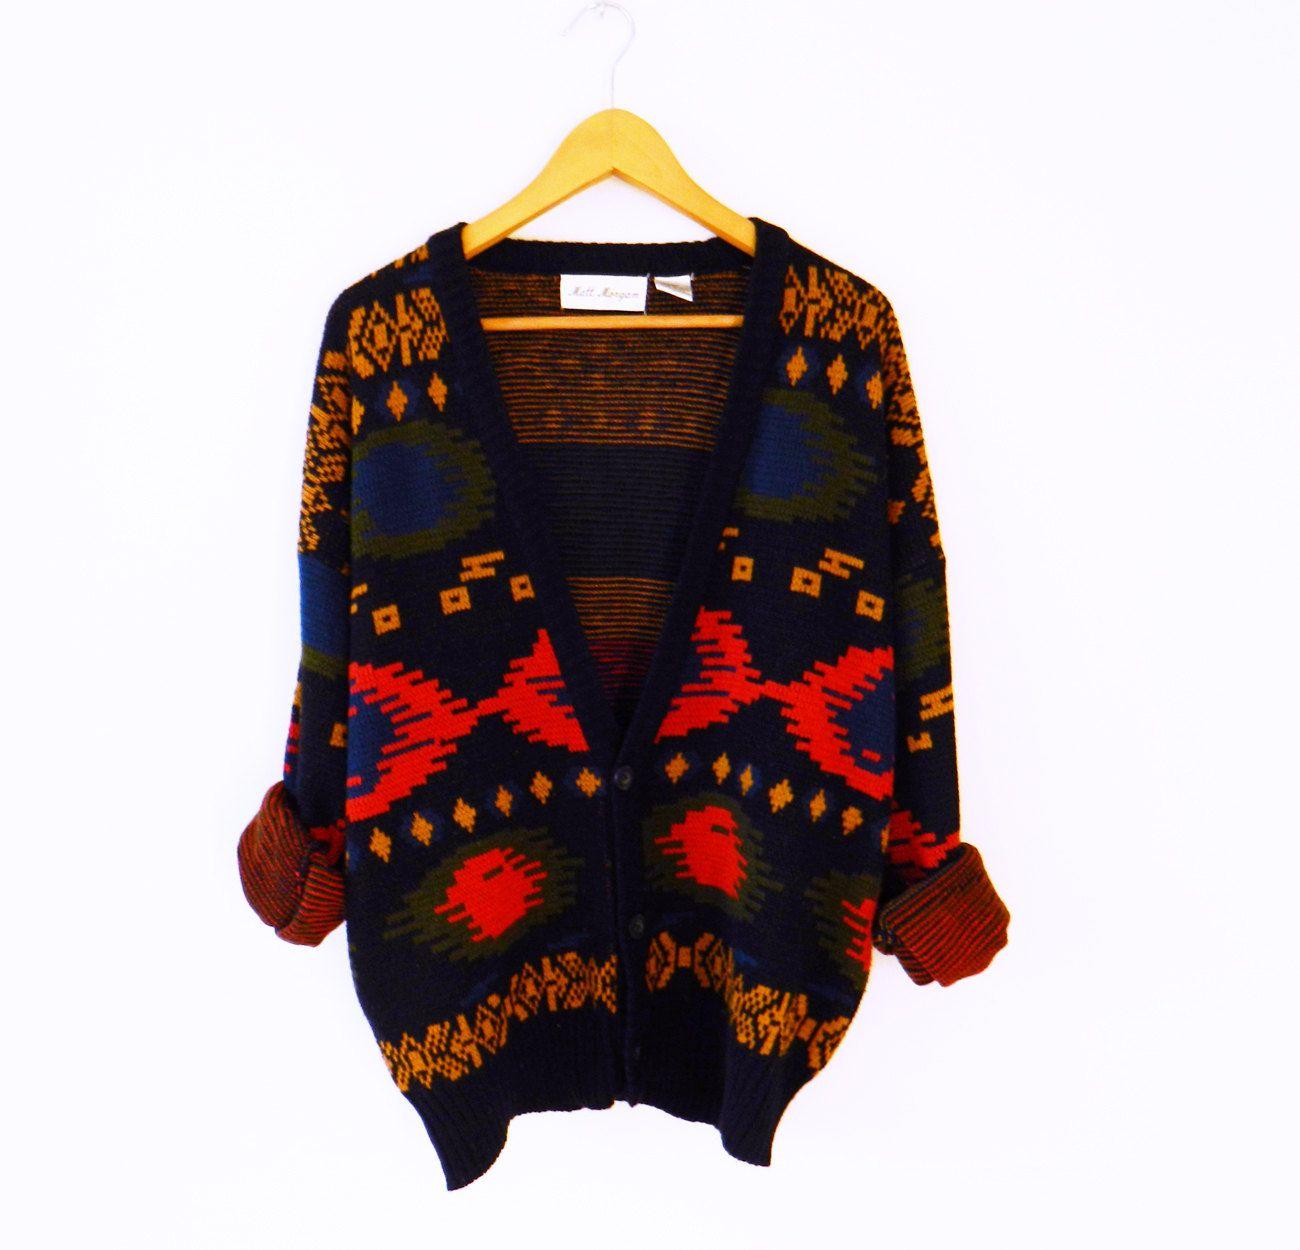 Tribal Vintage Oversized Cardigan Sweater / Rad Vintage Boho ...